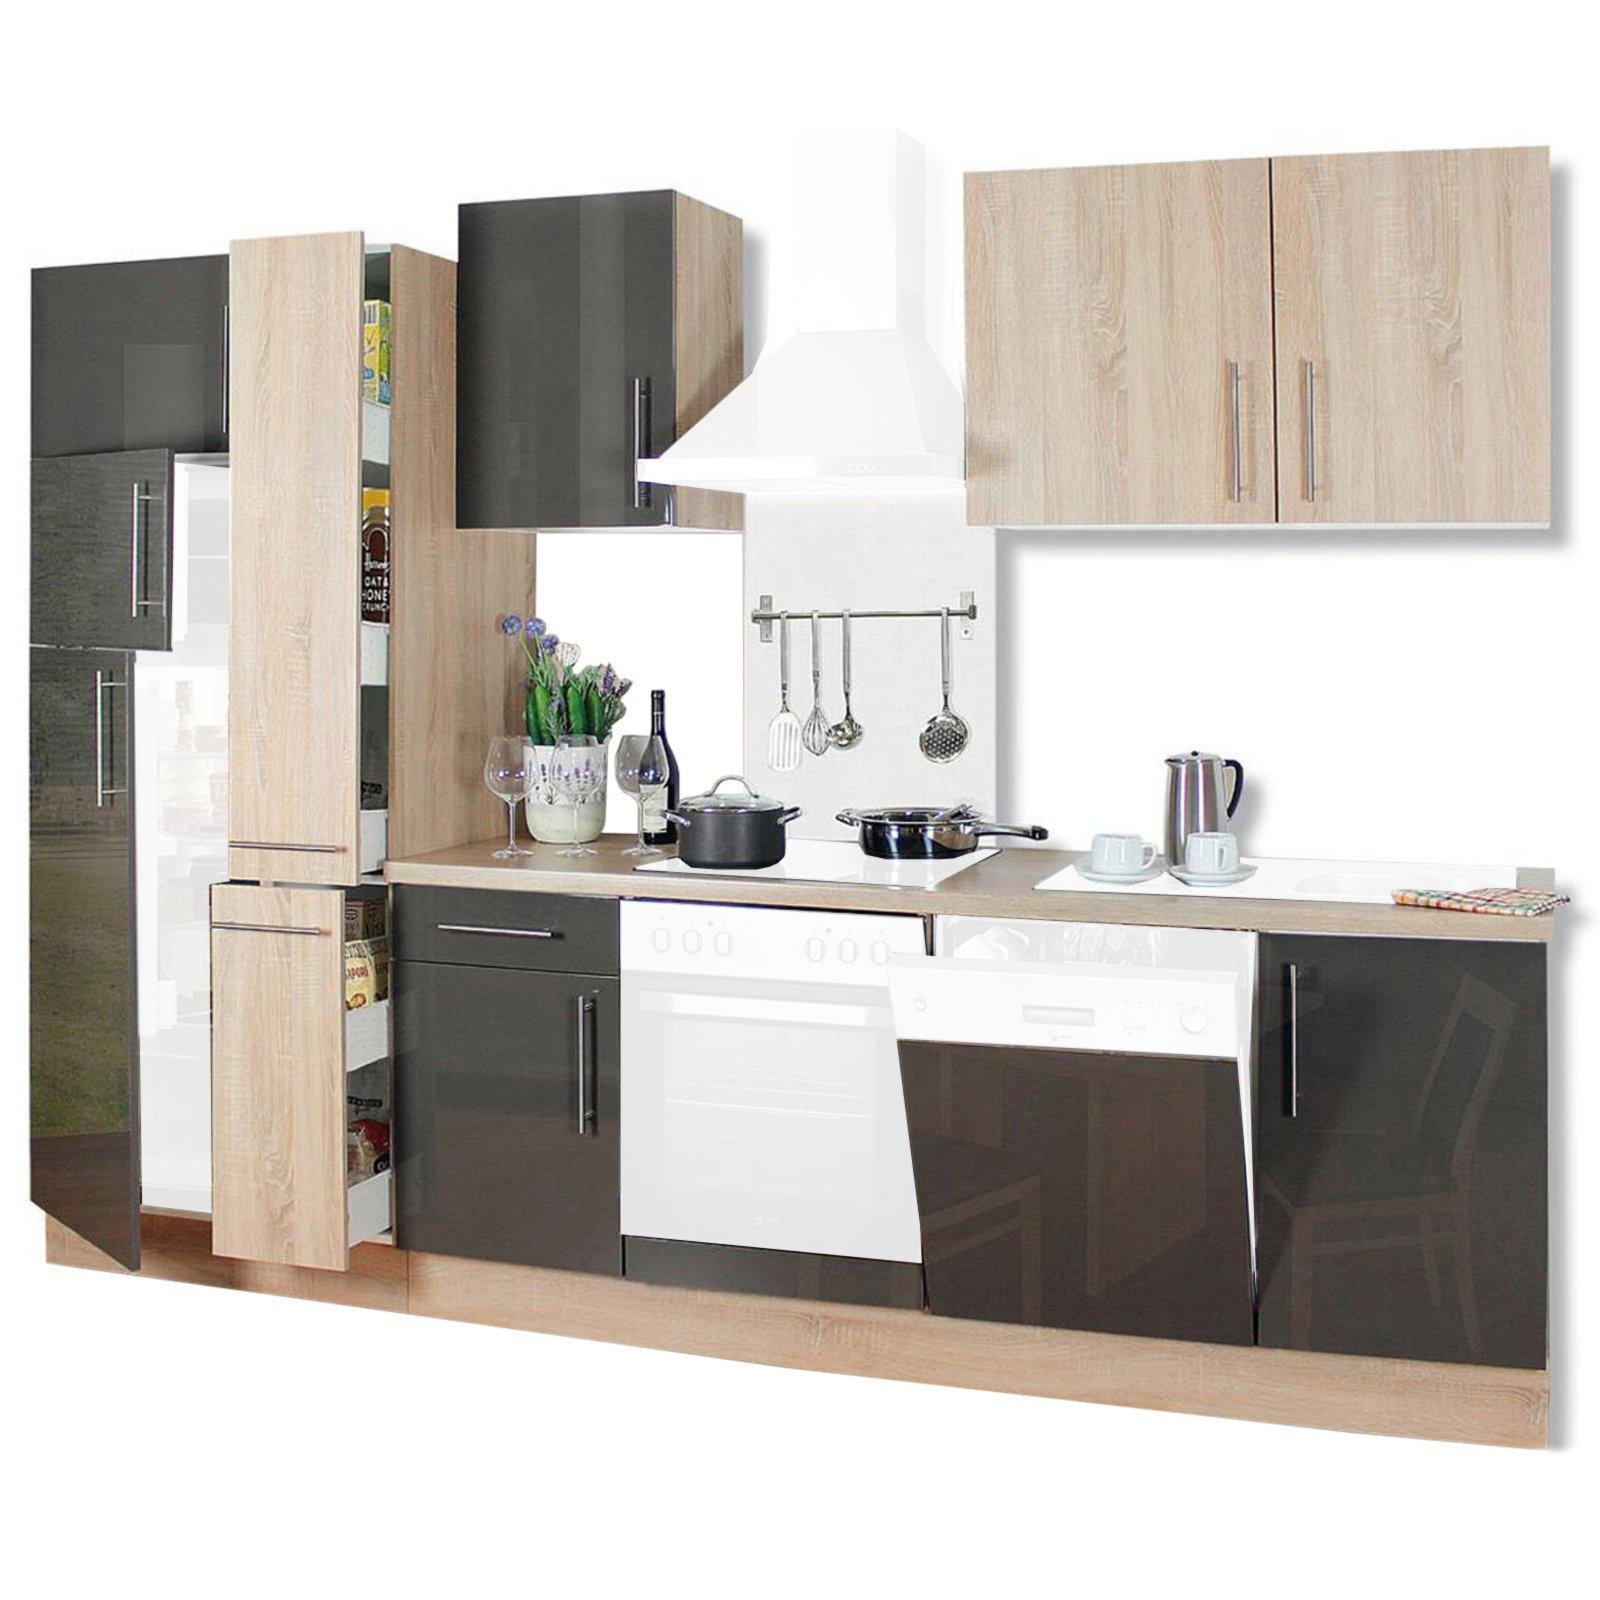 k chenblock jana sonoma eiche lava hochglanz 310 cm ebay. Black Bedroom Furniture Sets. Home Design Ideas